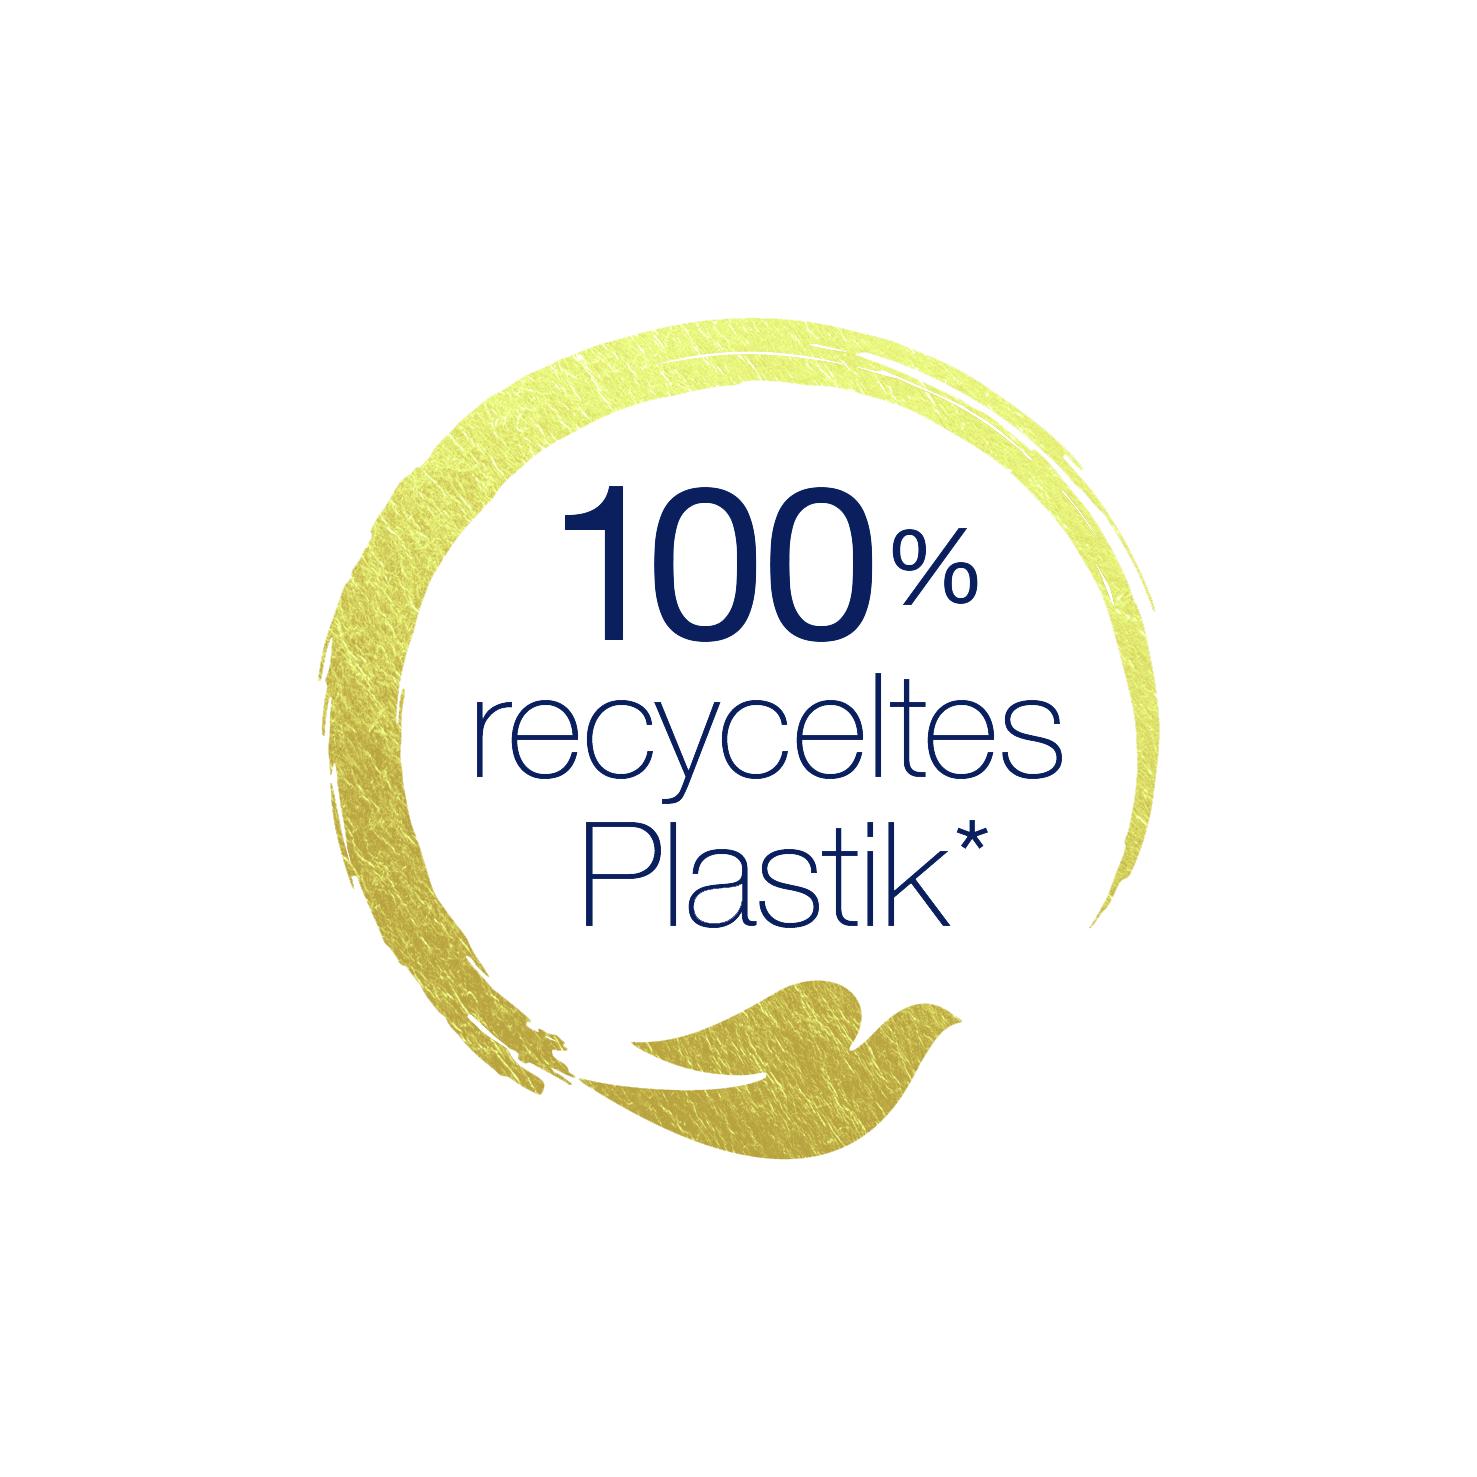 Dove 100% recyceltes Plastik*